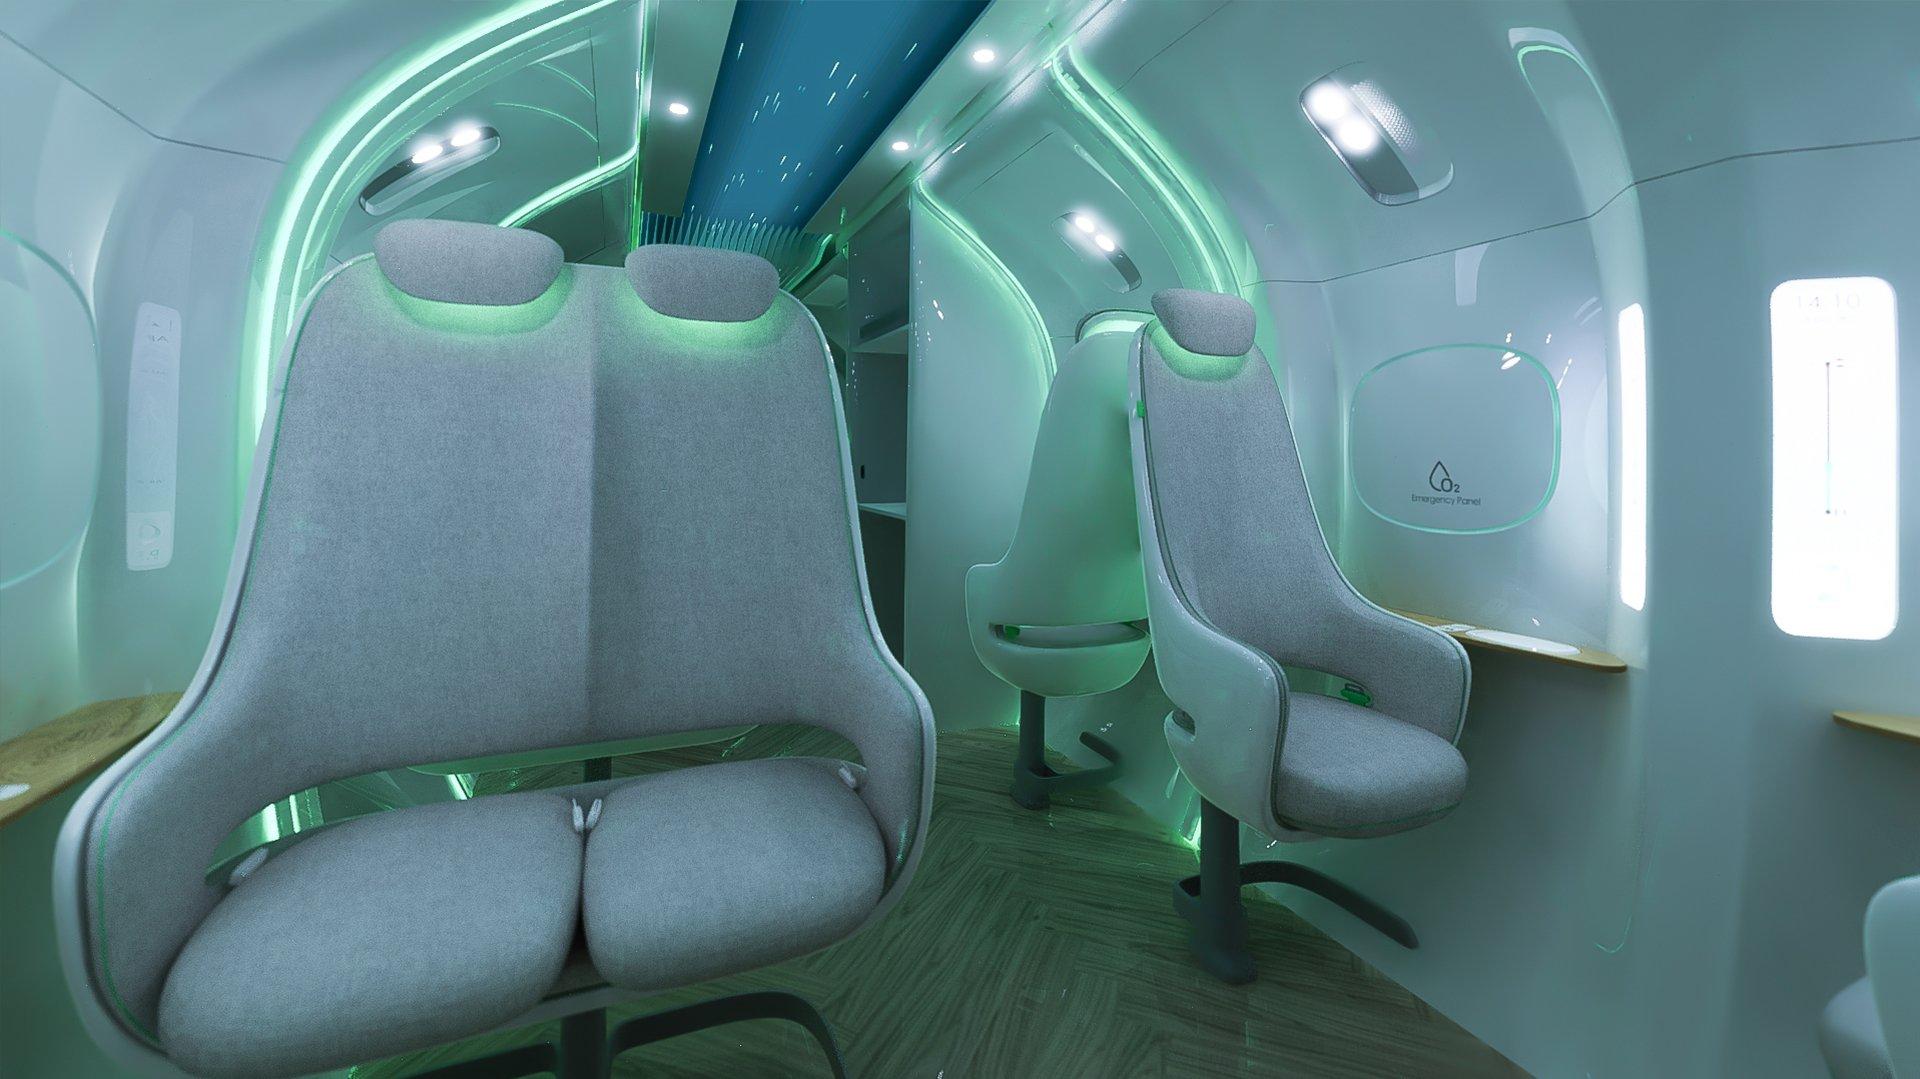 kamran-rahmani-delft-hyperloop-keyshot-3d-rendering-07